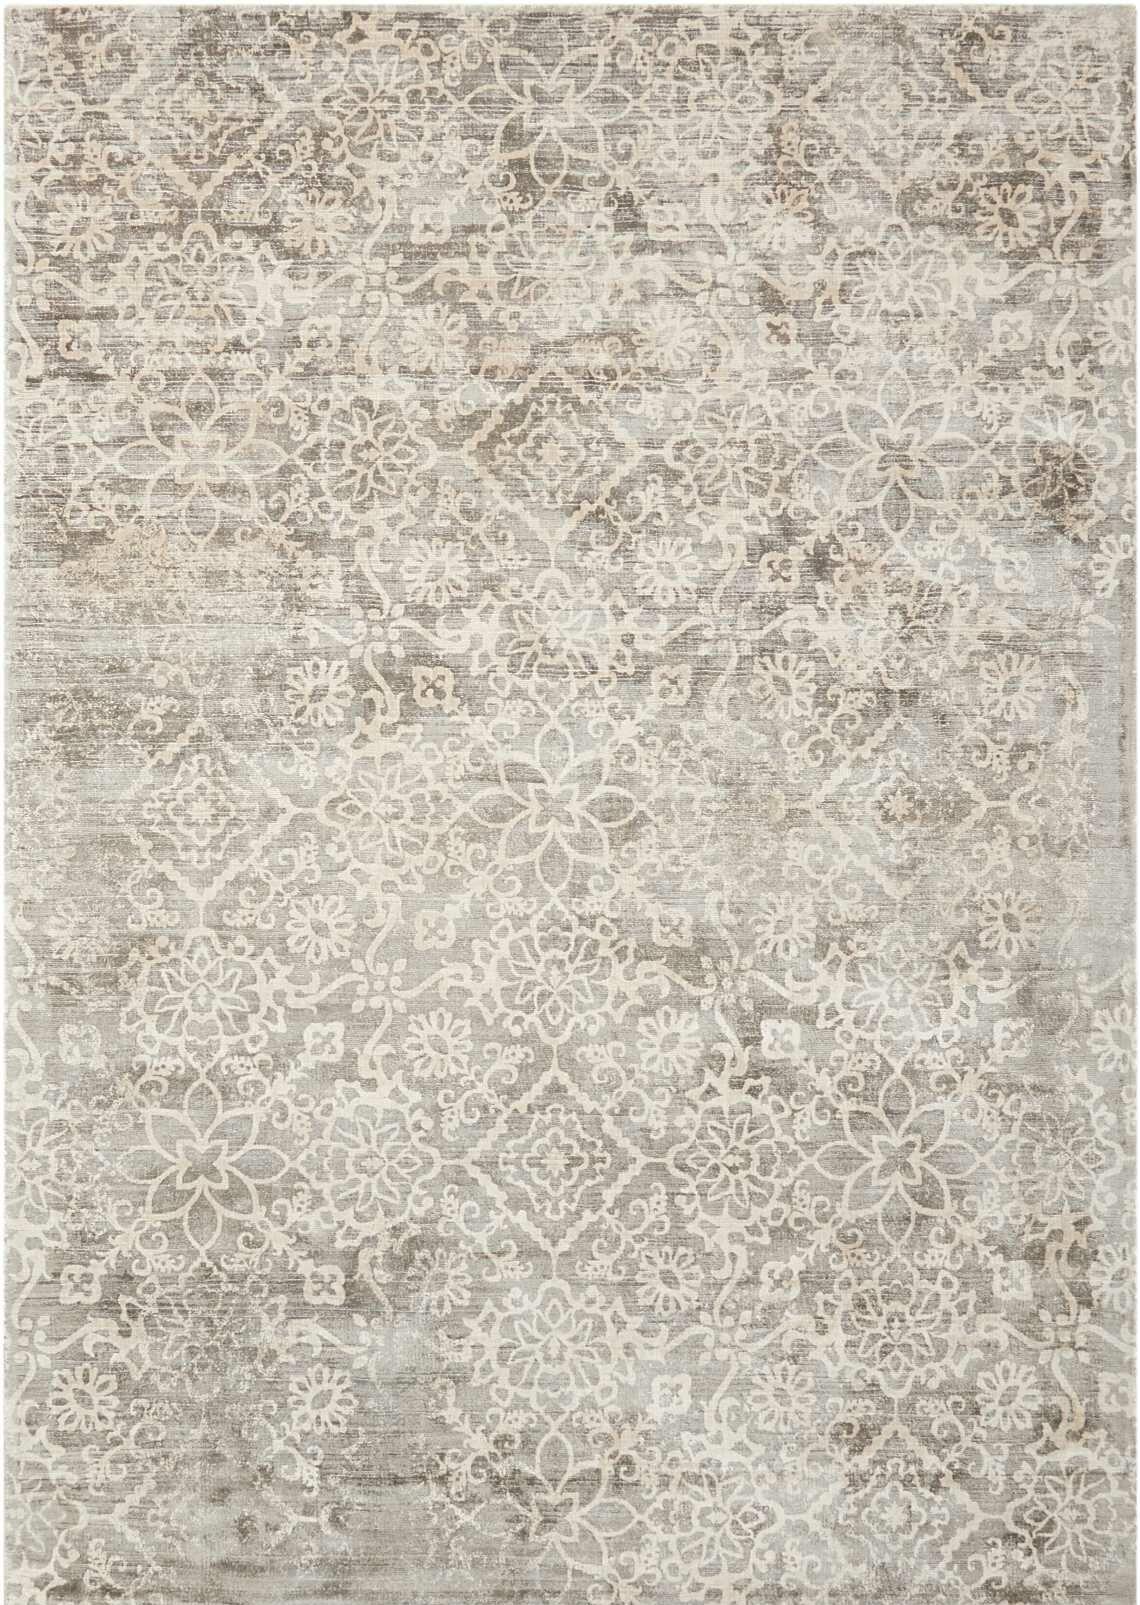 Desert Skies Hand-Loomed Gray Area Rug Rug Size: Rectangle 8' x 11'